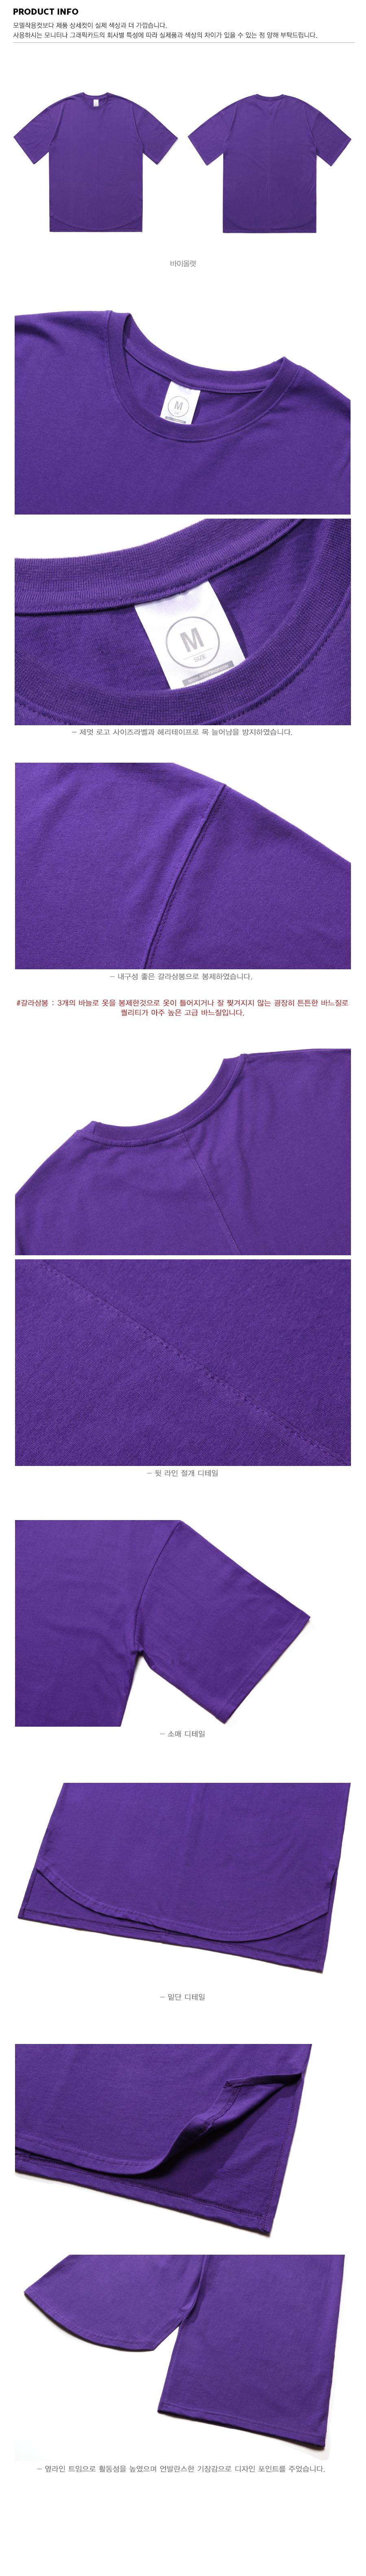 20180313_overfit_short_sleeve_detail_violet_kj.jpg